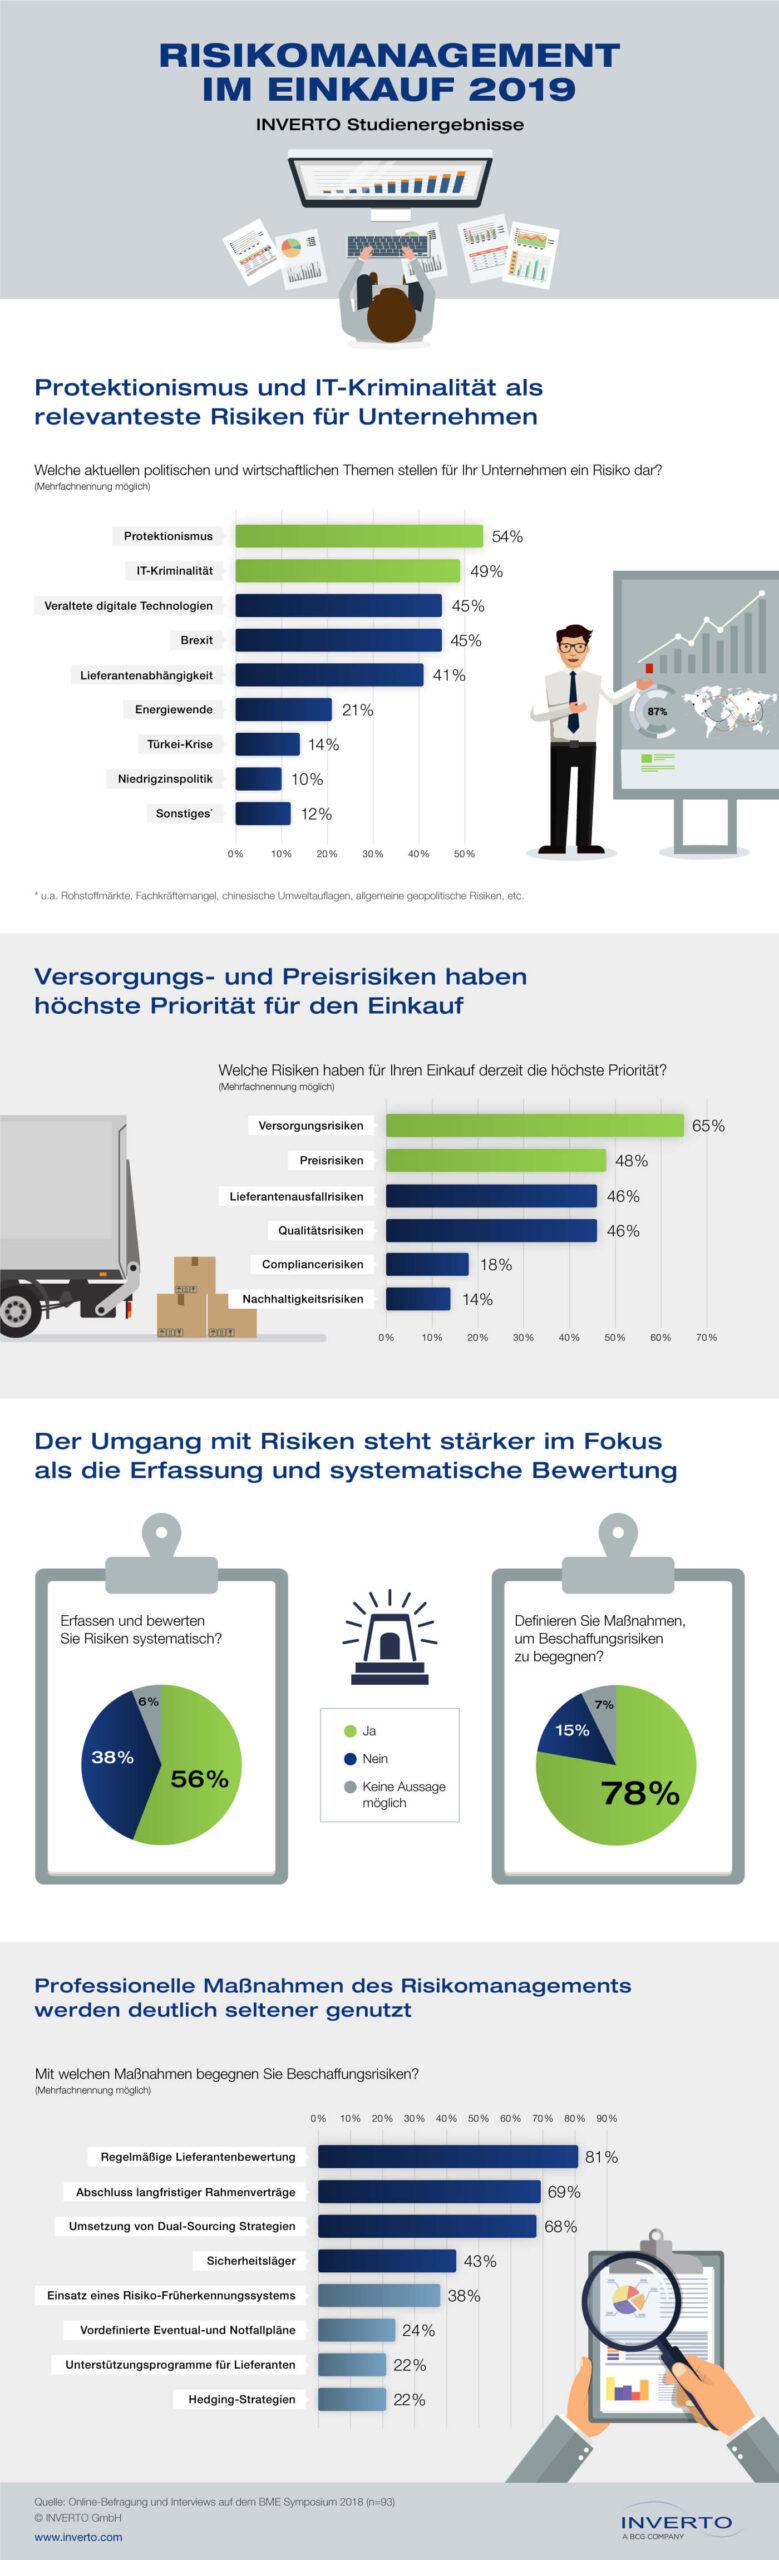 Infografik zum Thema Risikomanagement im Einkauf 2019